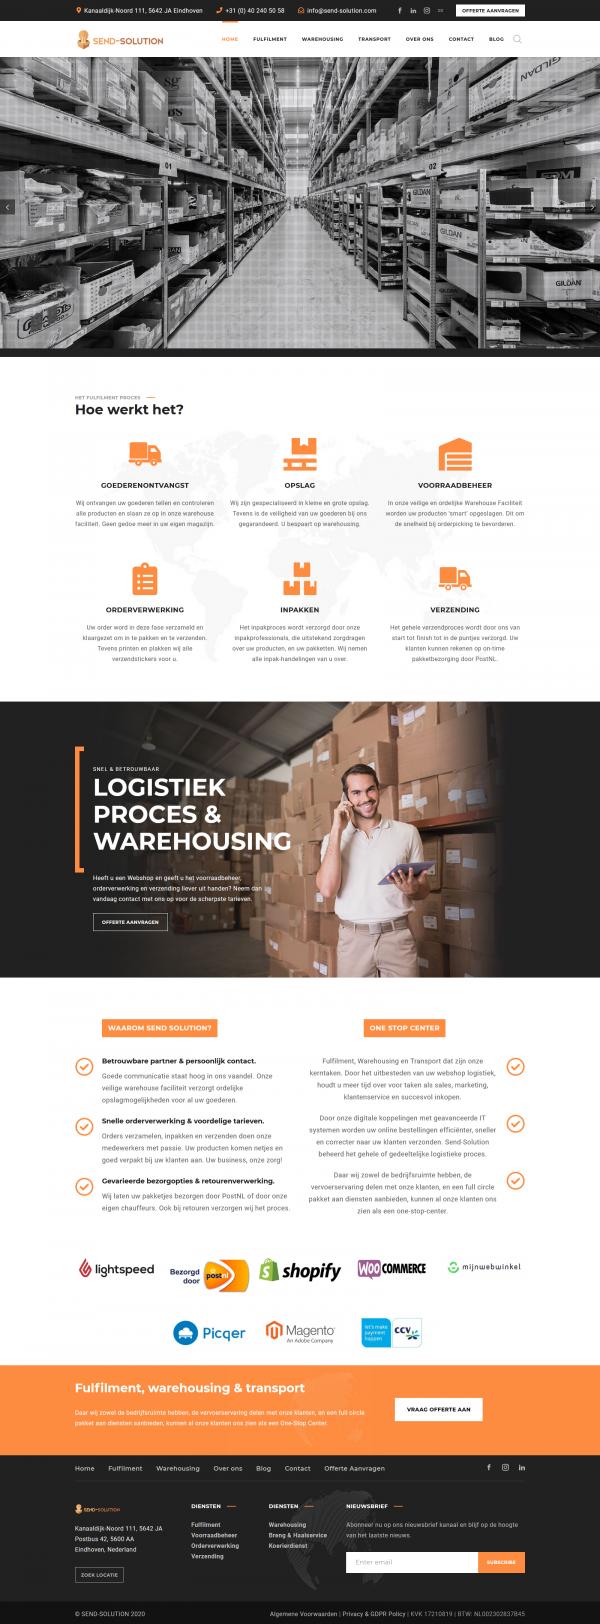 seo-specialist_Wageningen_Websitedesigner.nu_12.jpg